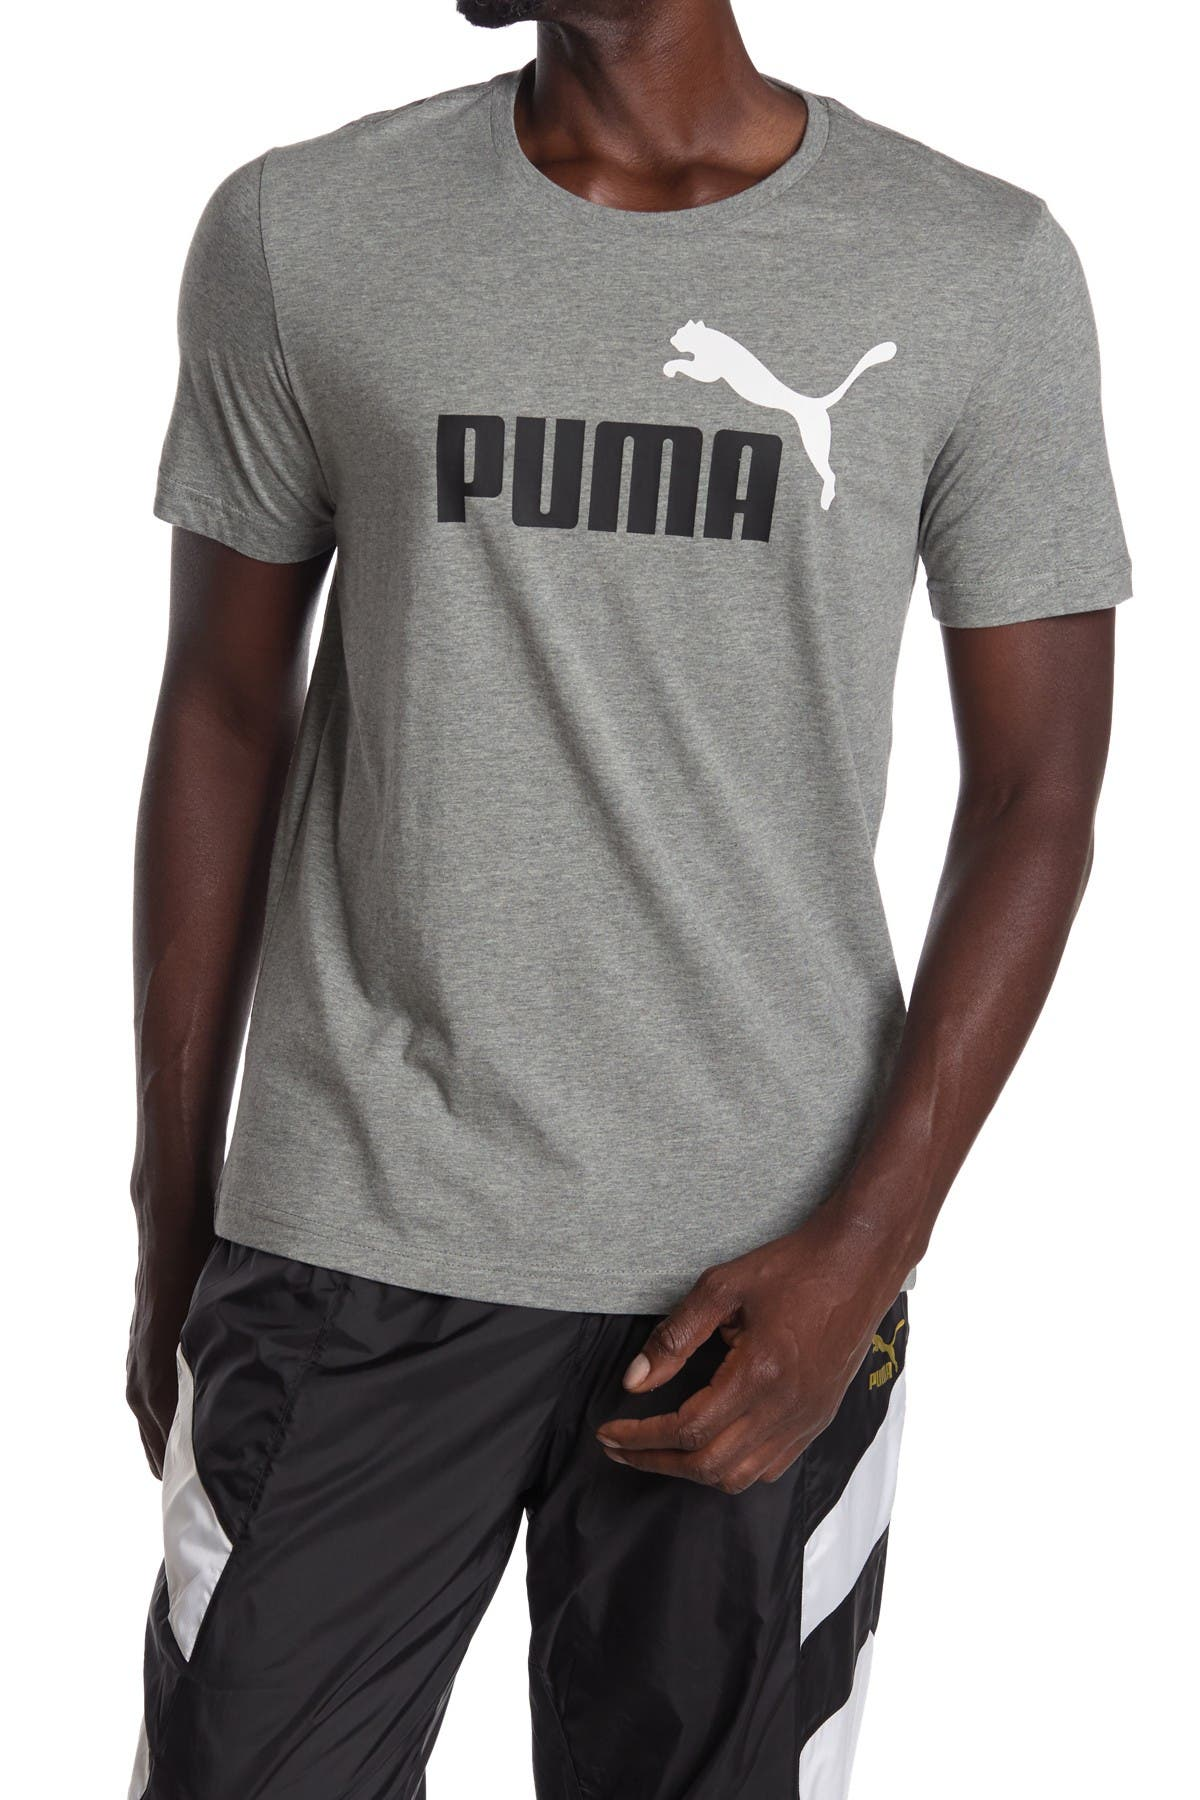 Image of PUMA Logo Tee